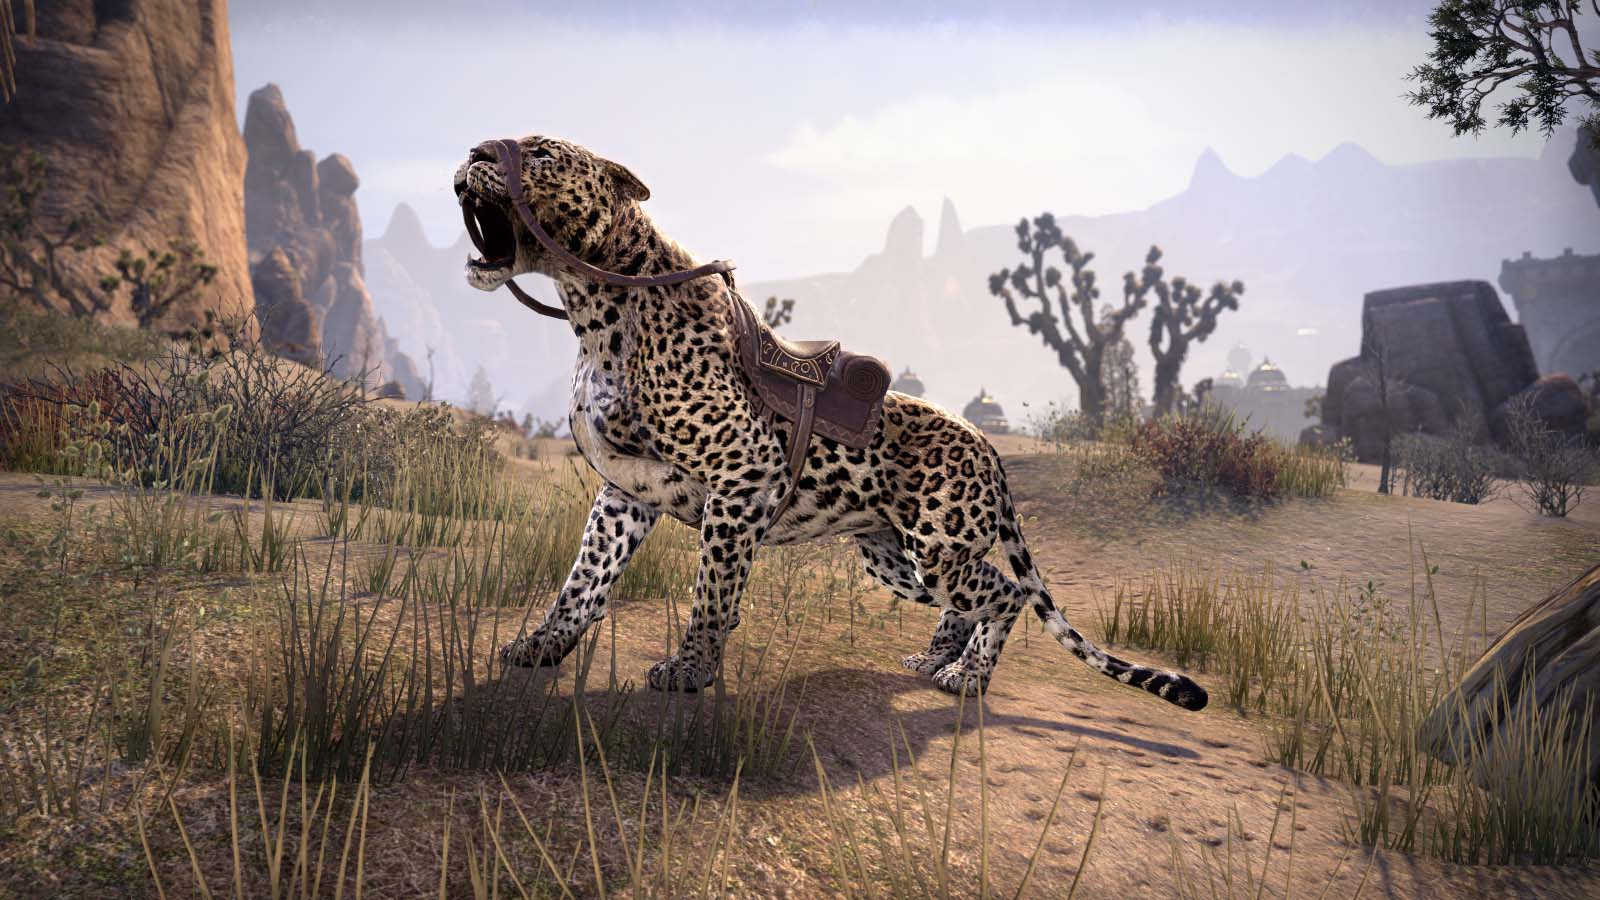 sencheleopard